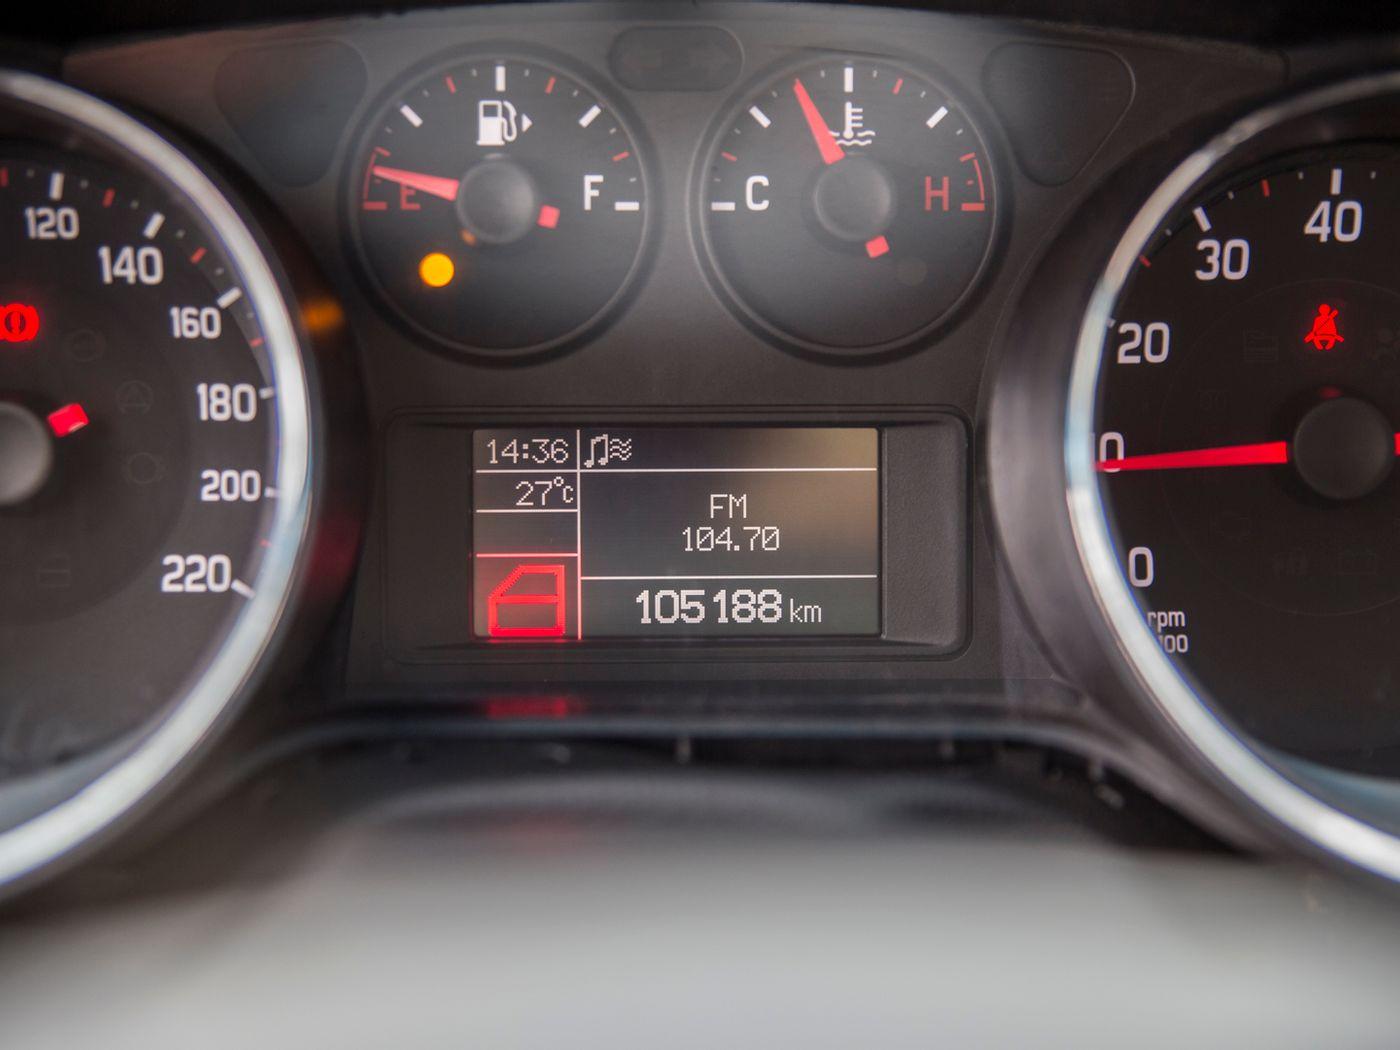 Fiat Bravo ESSENCE 1.8 Flex 16V 5p